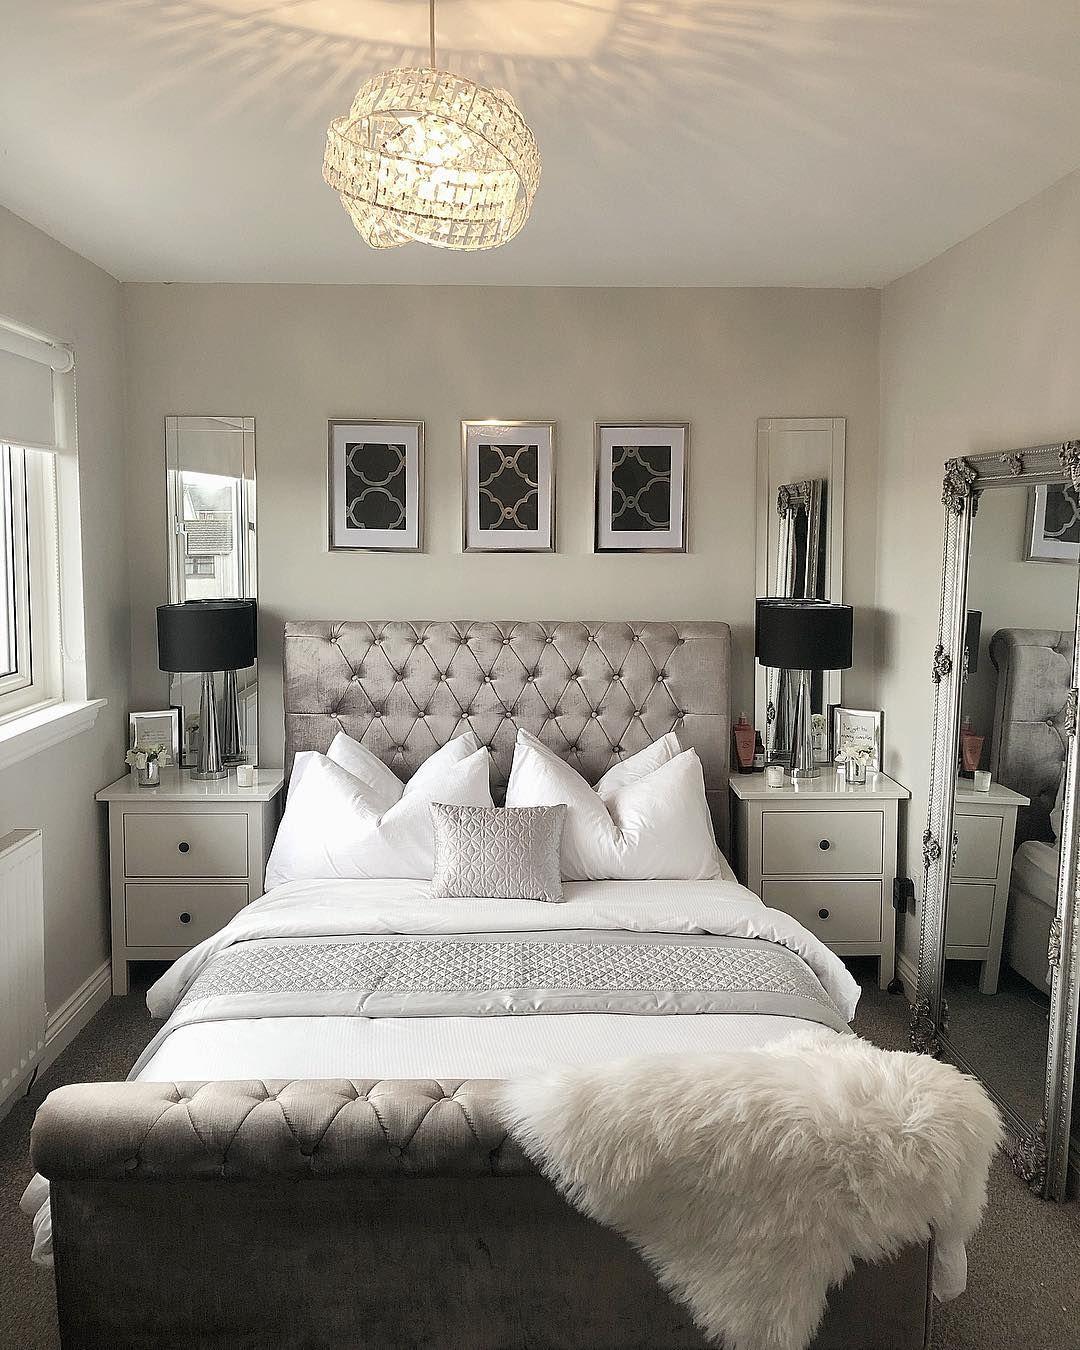 Mirrors behind nightstands   Silver bedroom furniture ... on Mirrors For Teenage Bedroom  id=51372